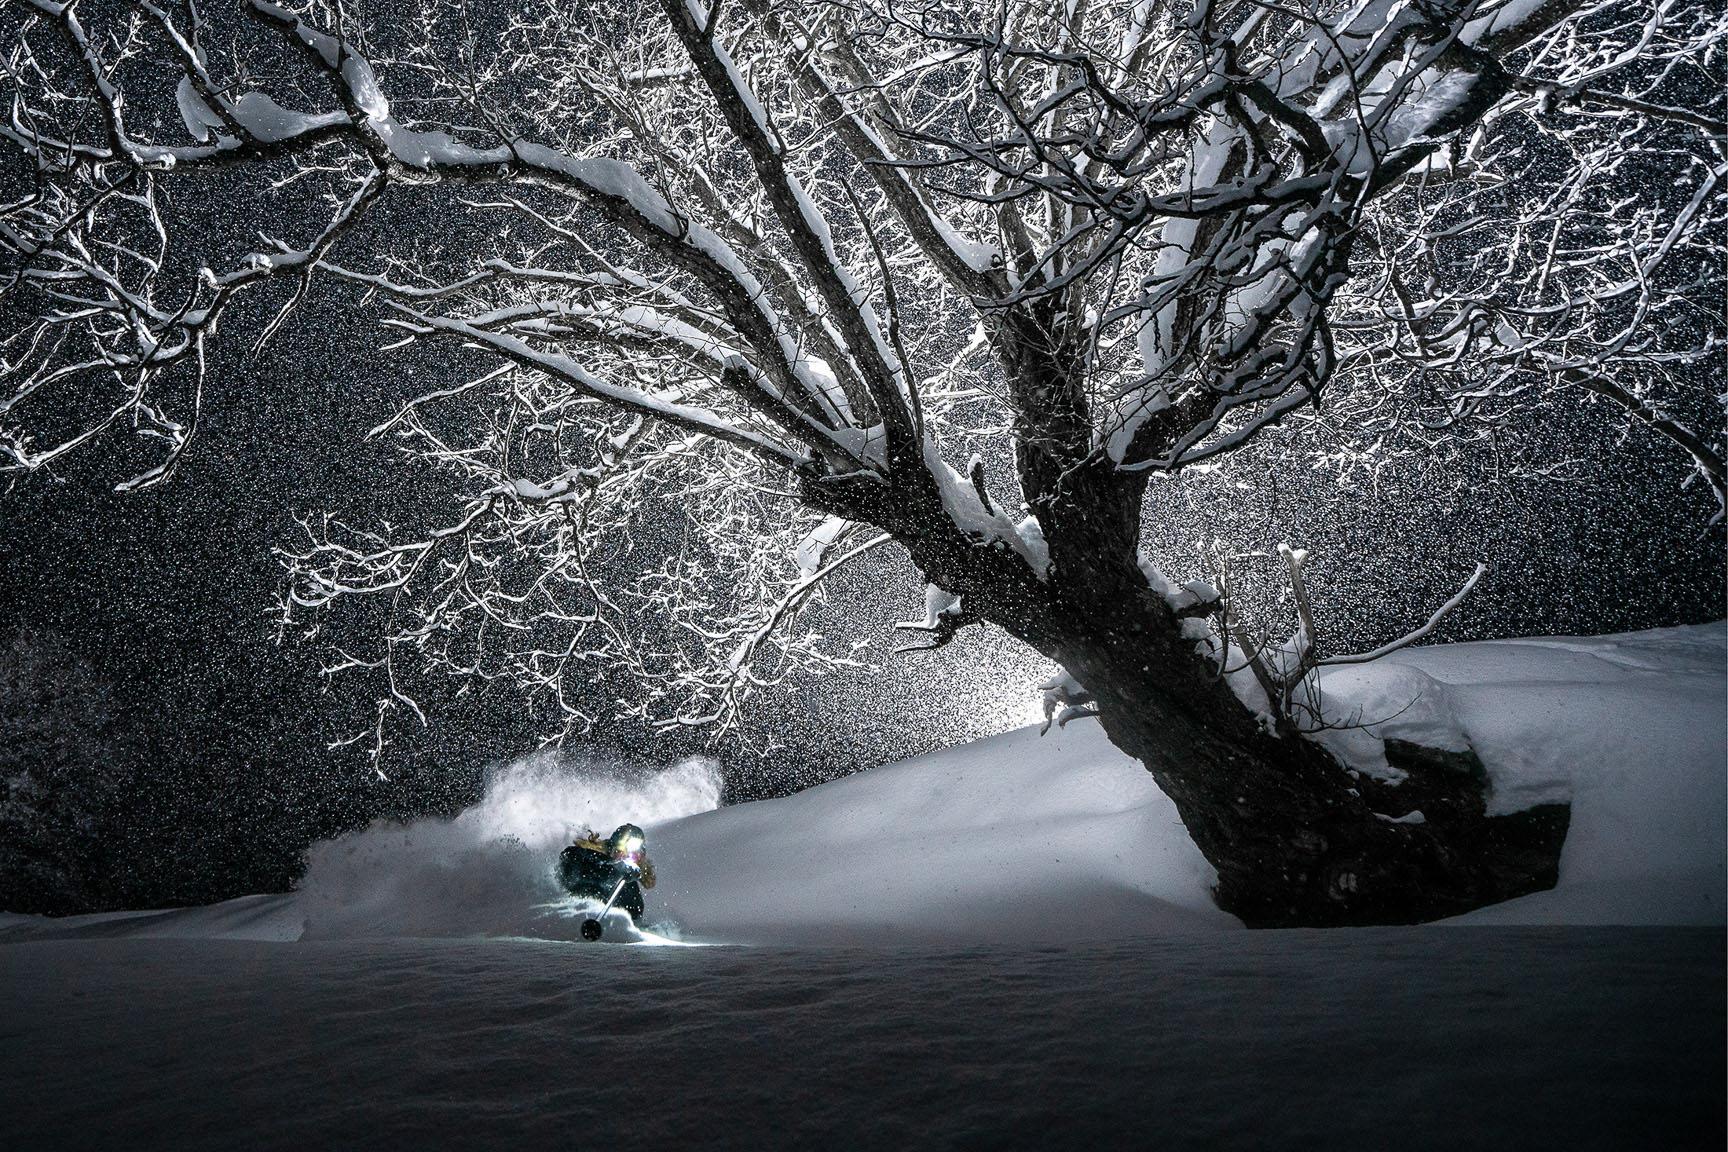 Karl-Kristian Muggerud, Sognal, Norway